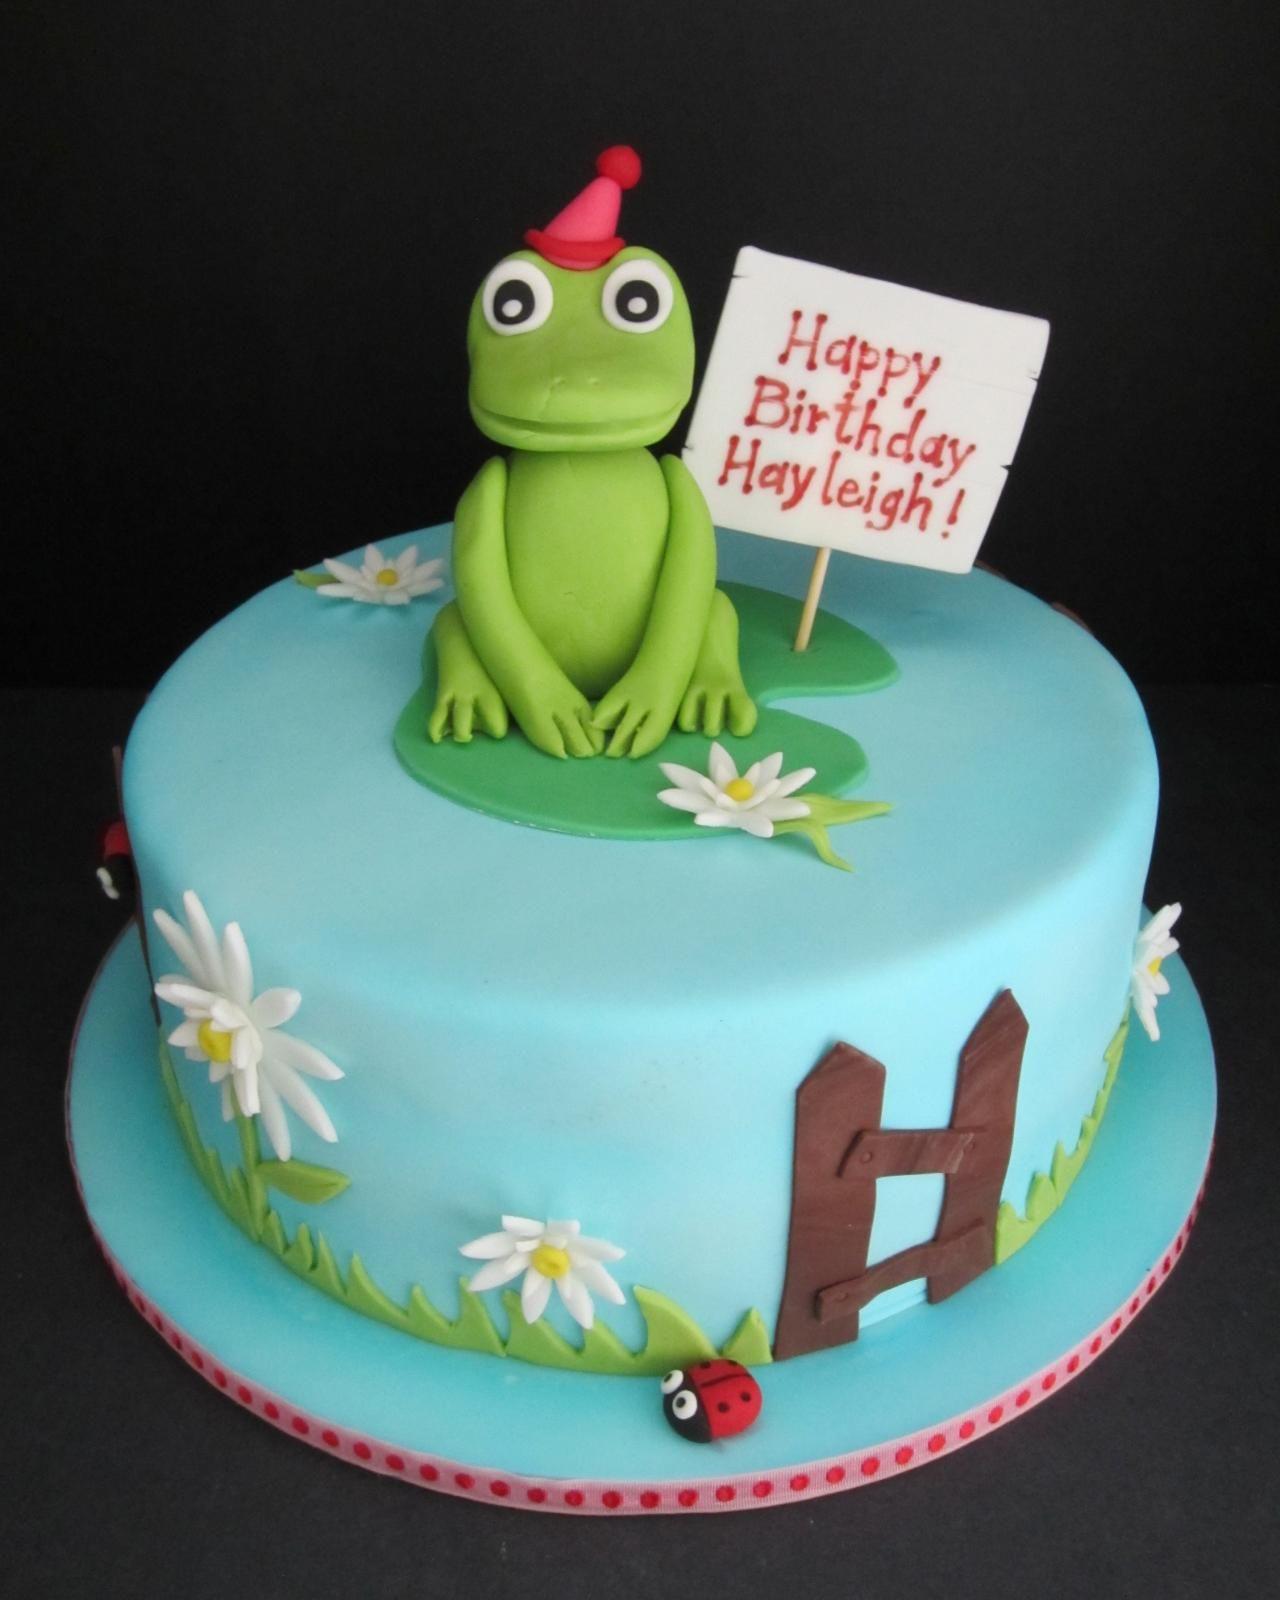 frog cakes | Frog Birthday Cake - Kempenfelt Cakes, Barrie Ontario ...